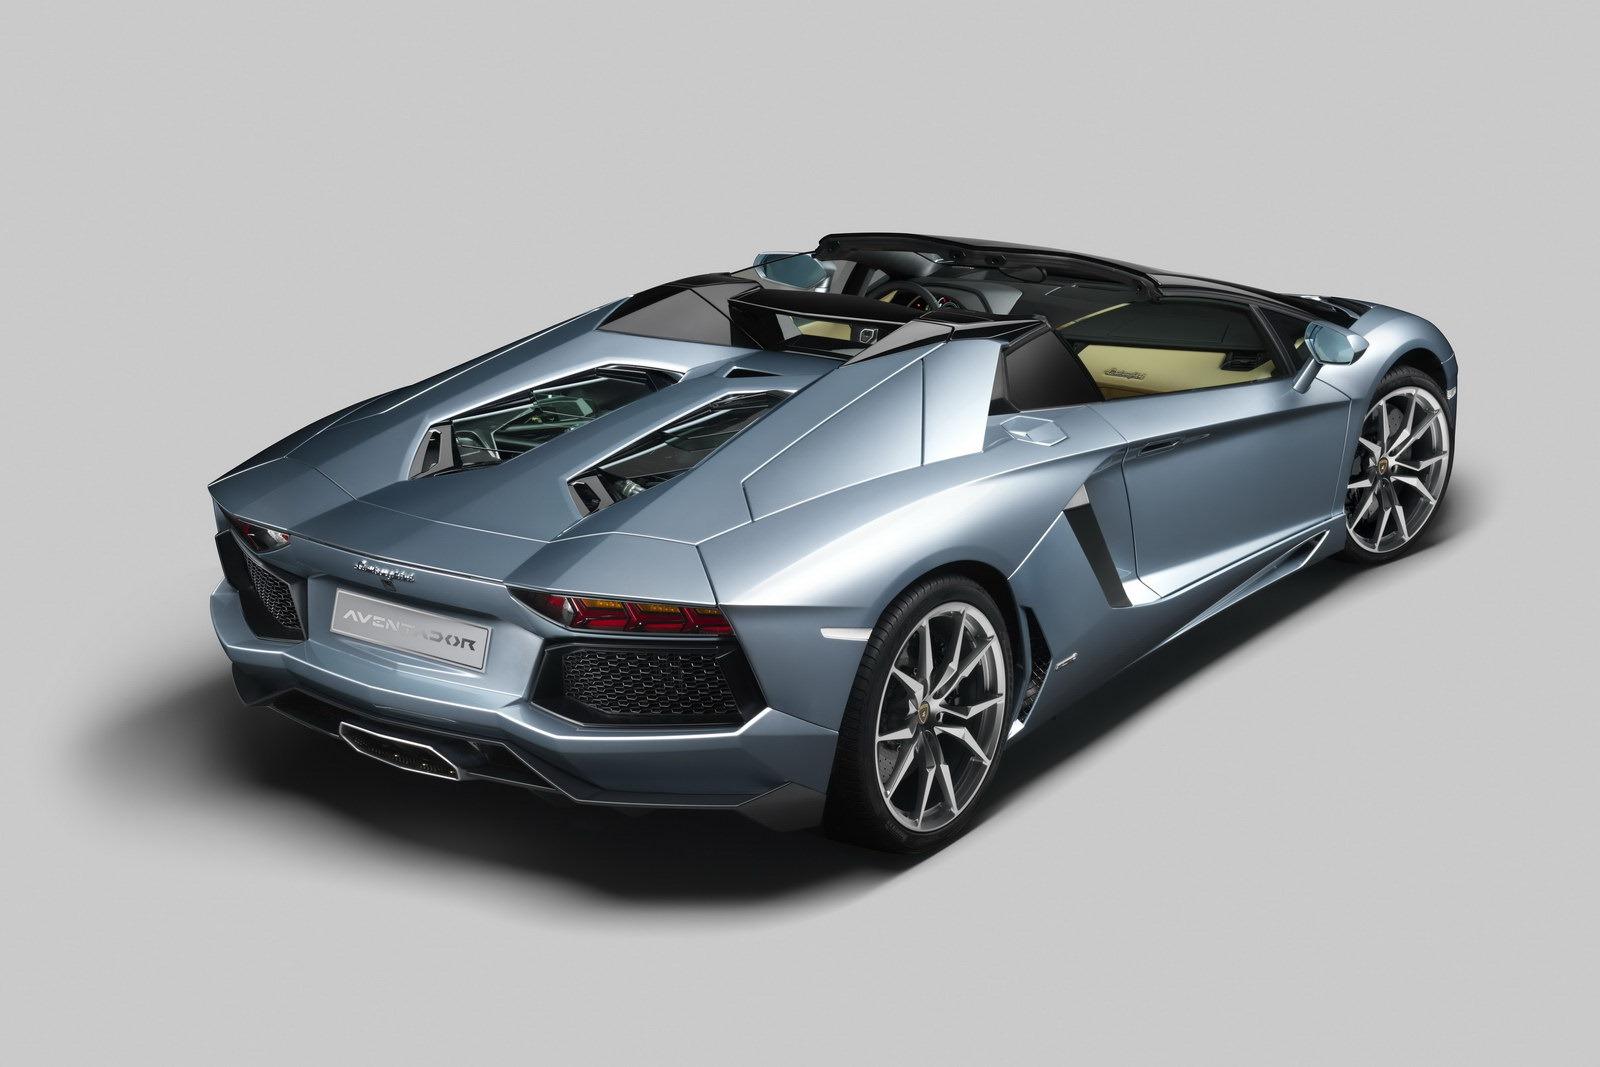 2013 lamborghini aventador lp700 4 roadster revealed autoevolution. Black Bedroom Furniture Sets. Home Design Ideas